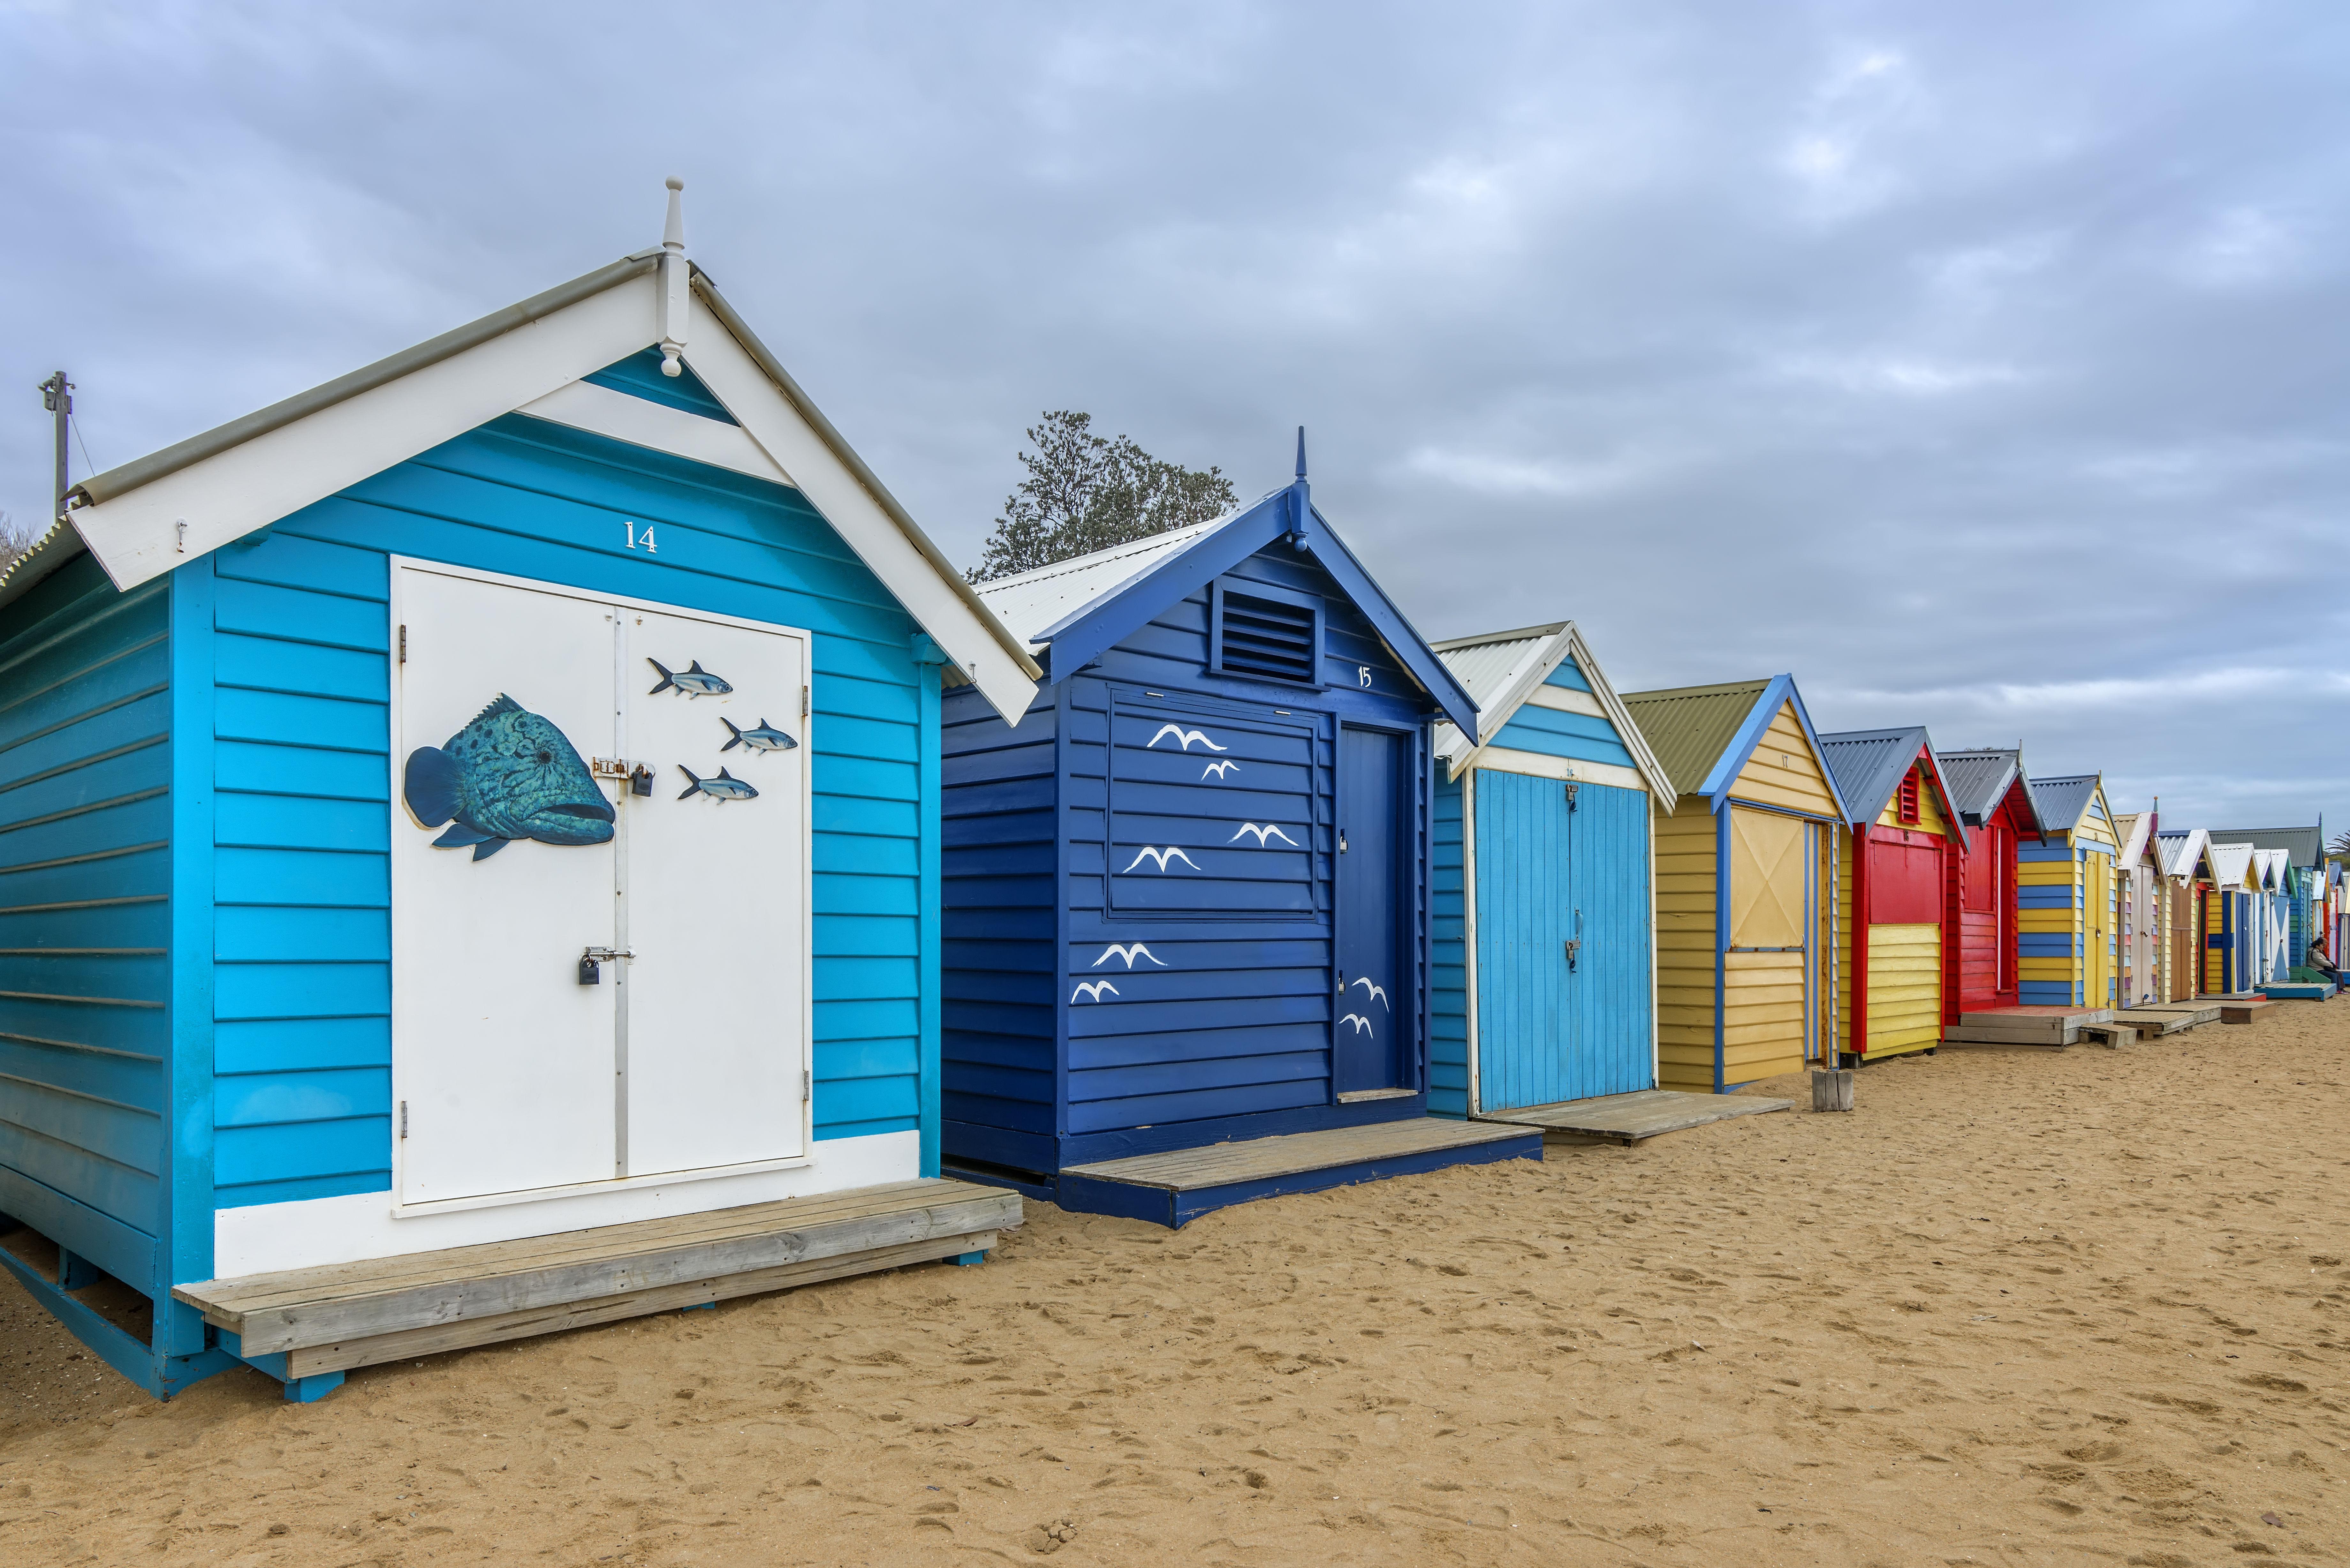 Free Images : beach, sand, sky, house, cloudy, building, barn, home ...